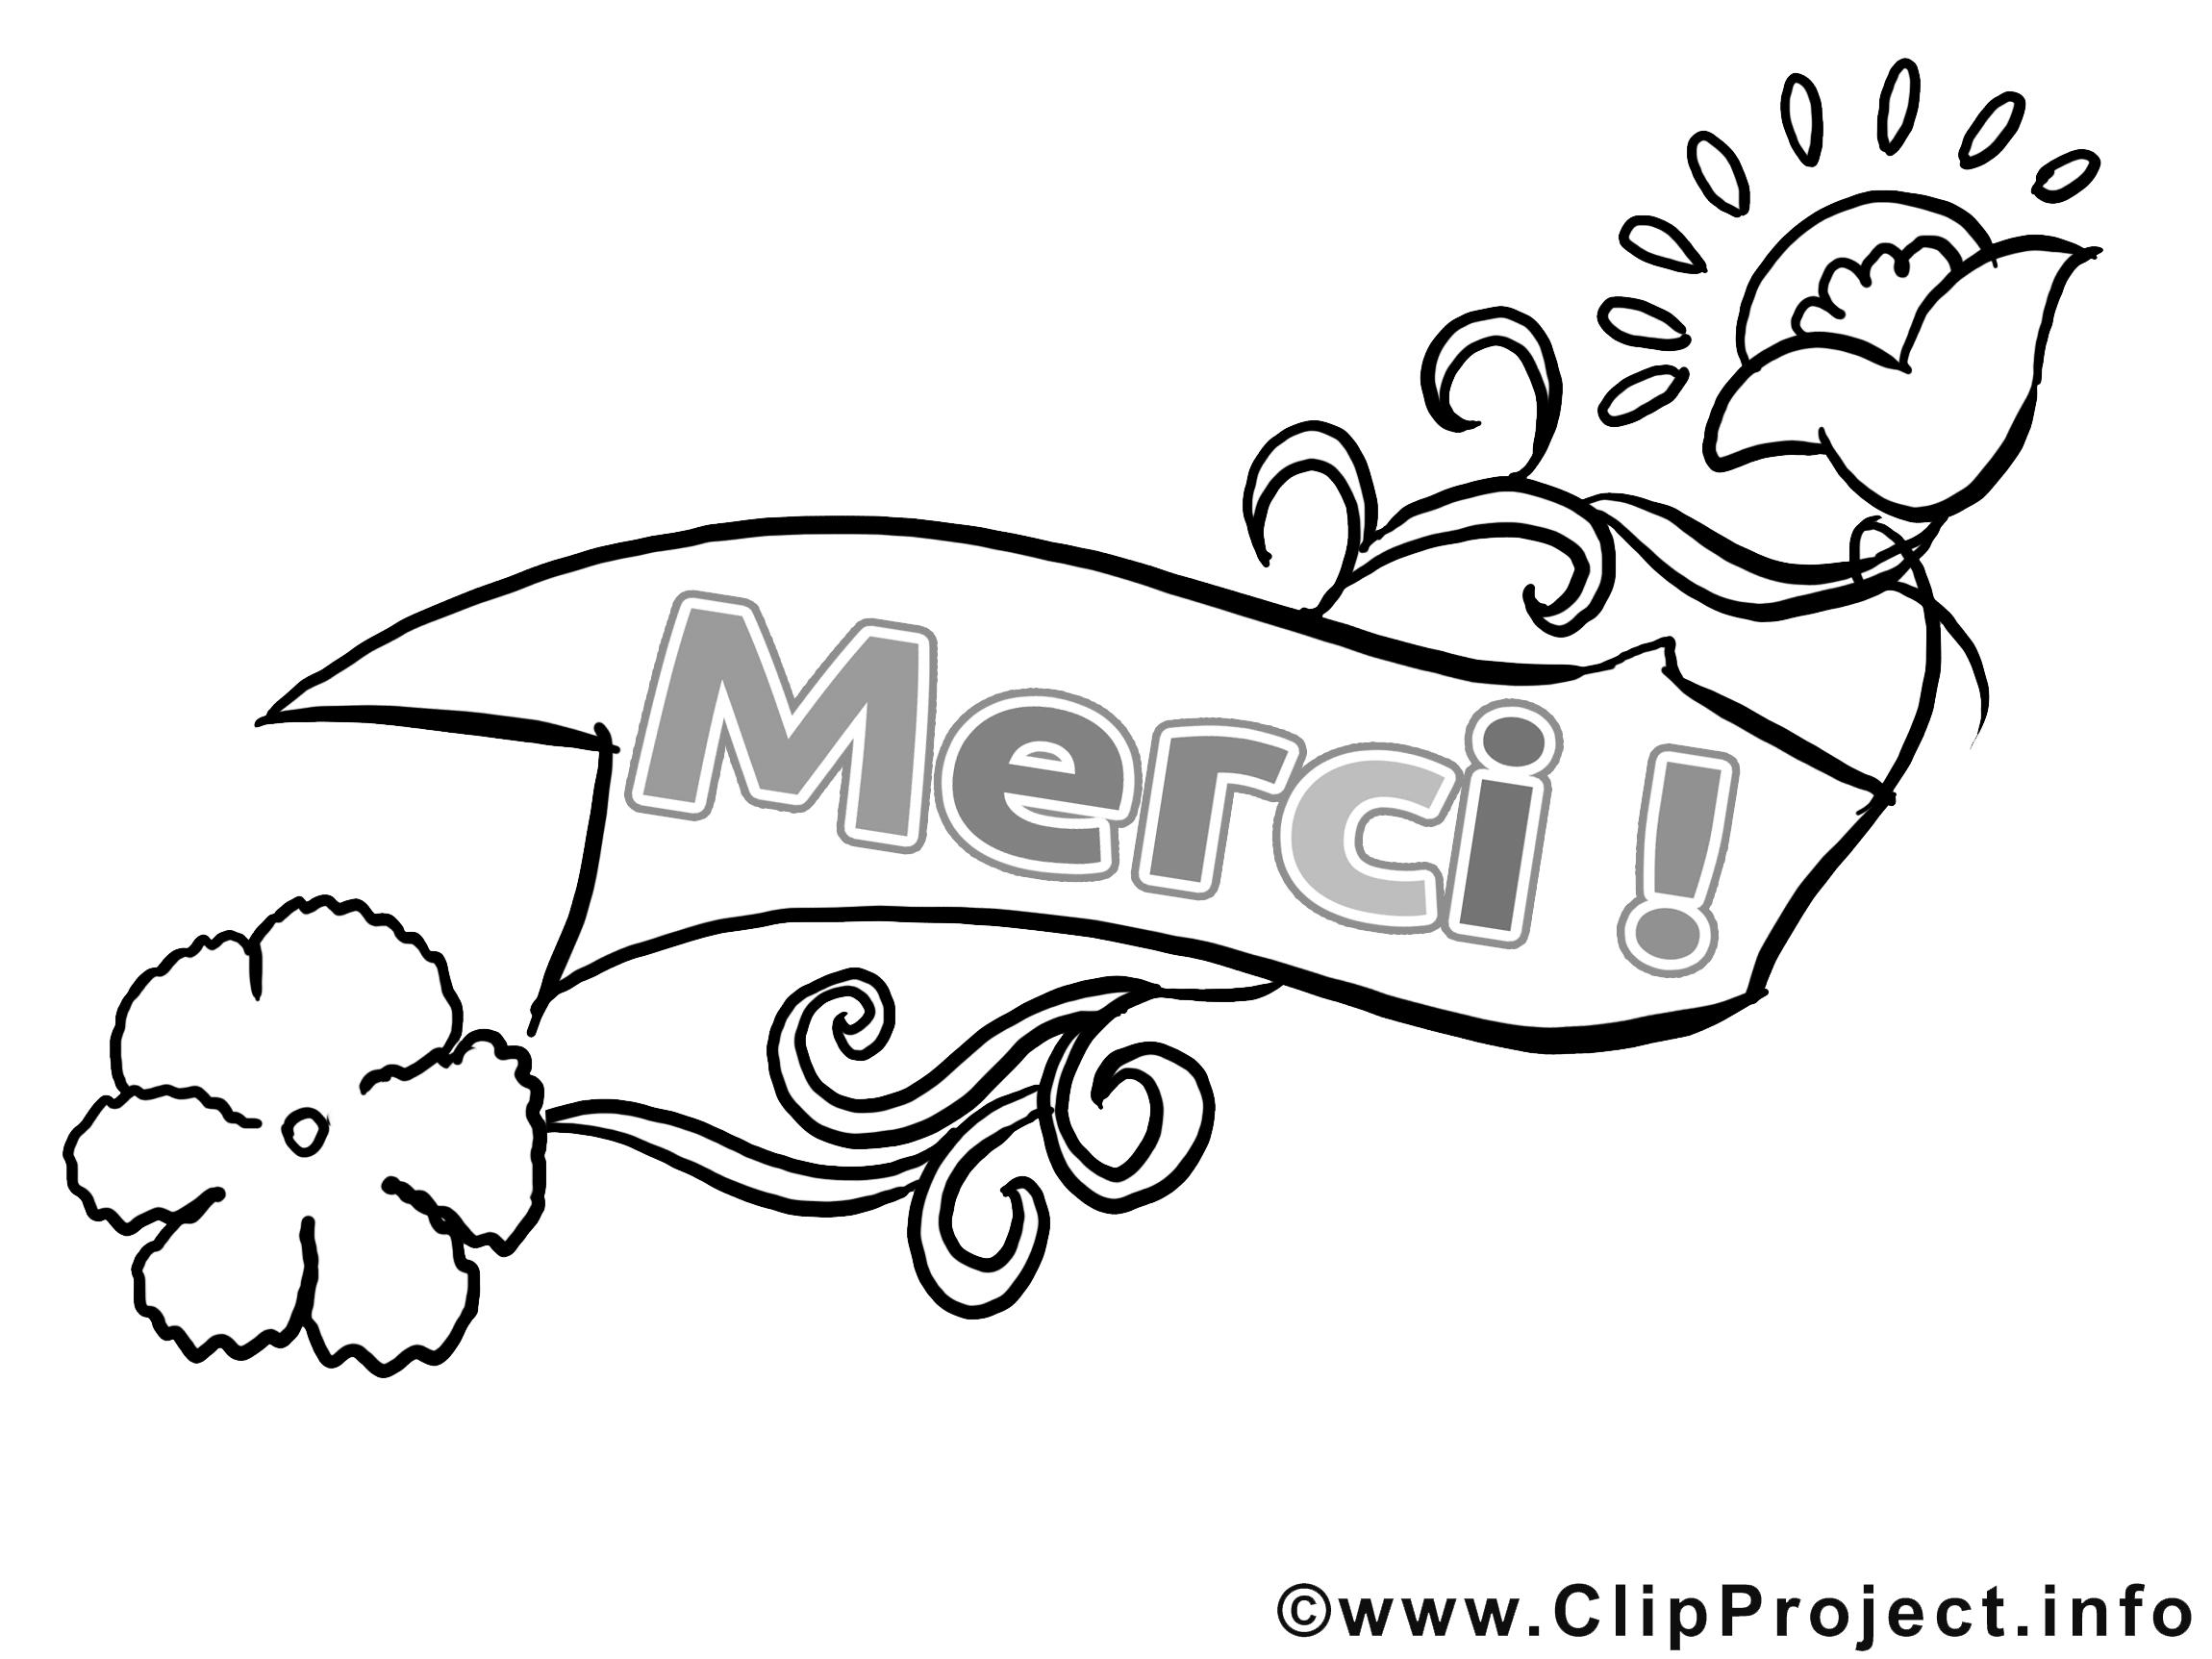 Fleurs clipart à imprimer - Merci dessins gratuits - Merci ...